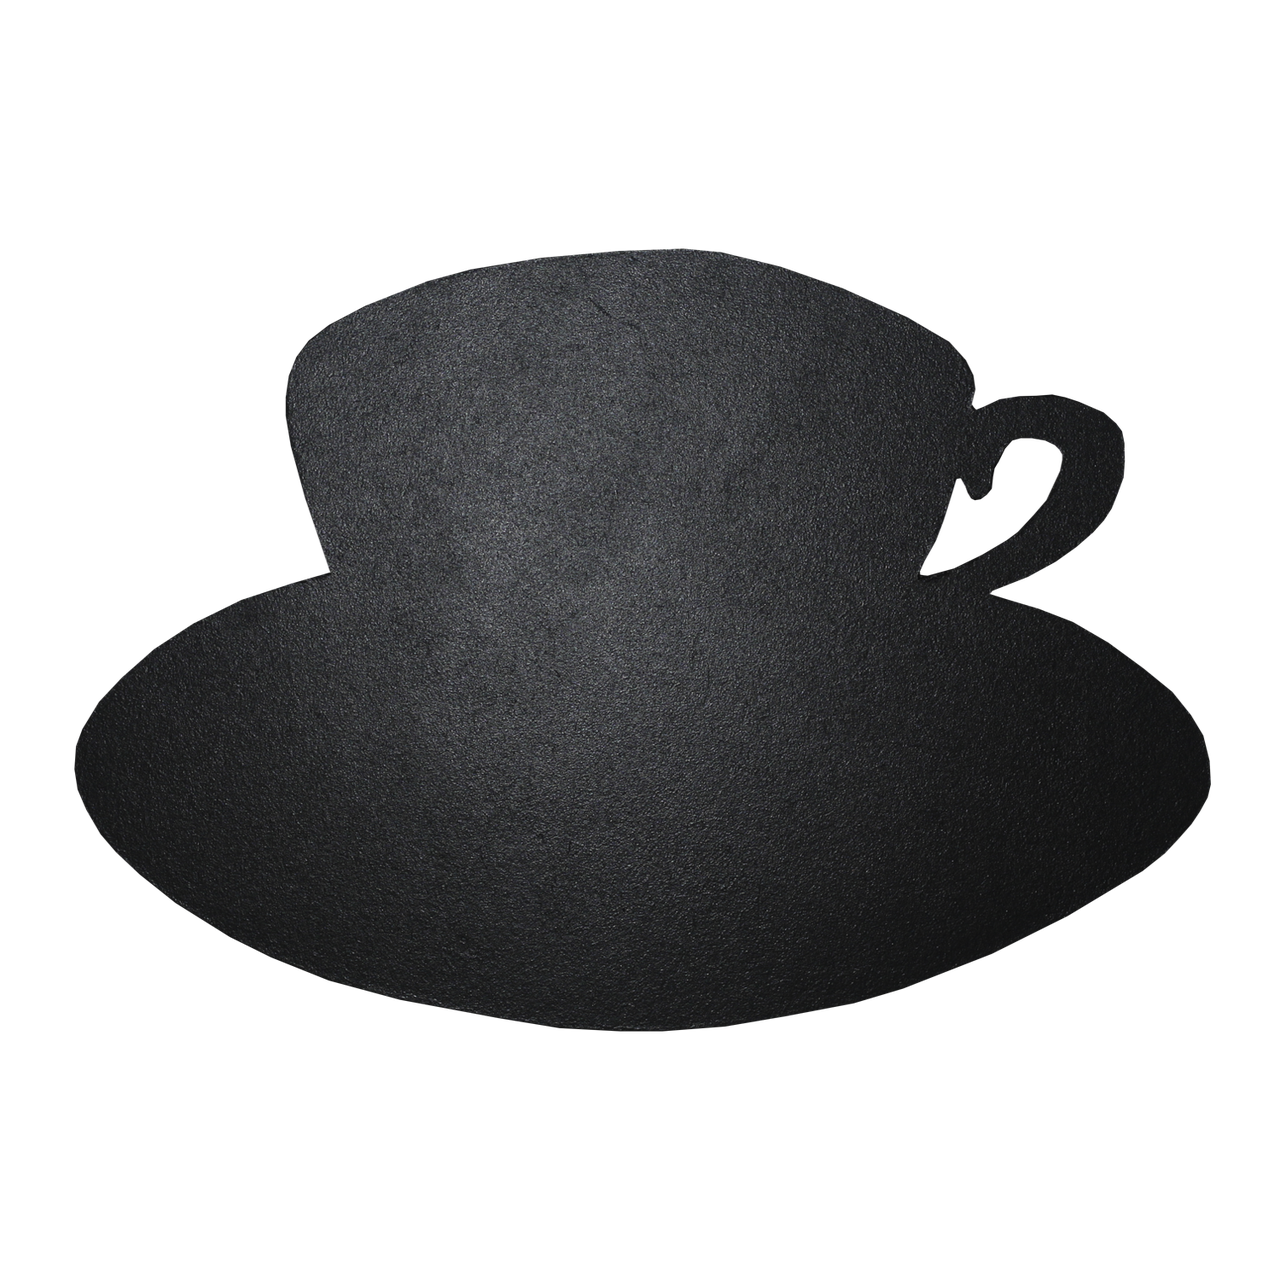 Доска меловая фигурная Чашка ПХ 480х330 мм